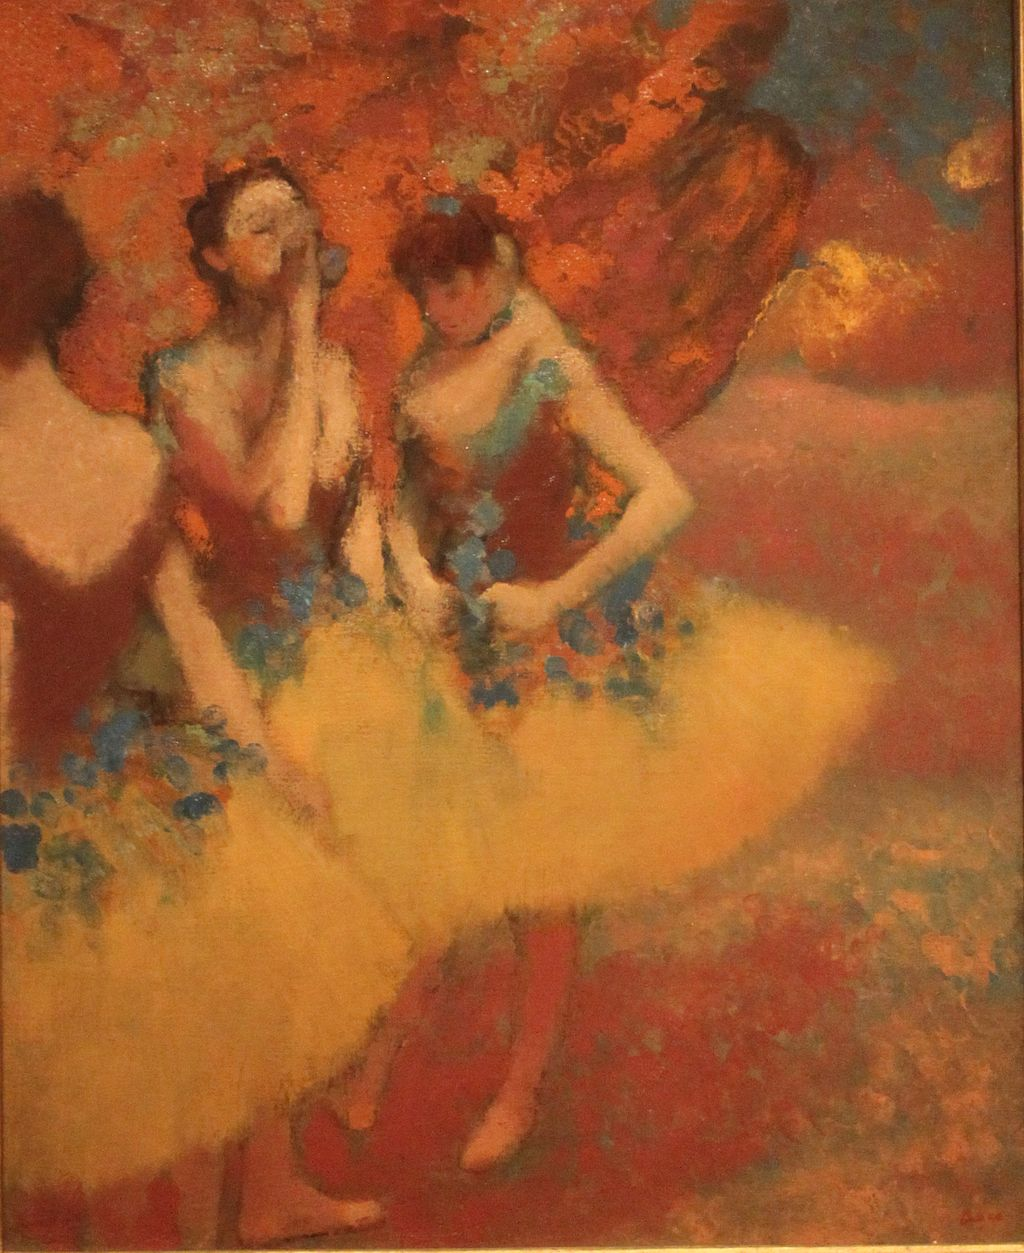 Edgar Degas,  Three Dancers in Yellow Skirts , c. 1891, The Detroit Institute of Arts.